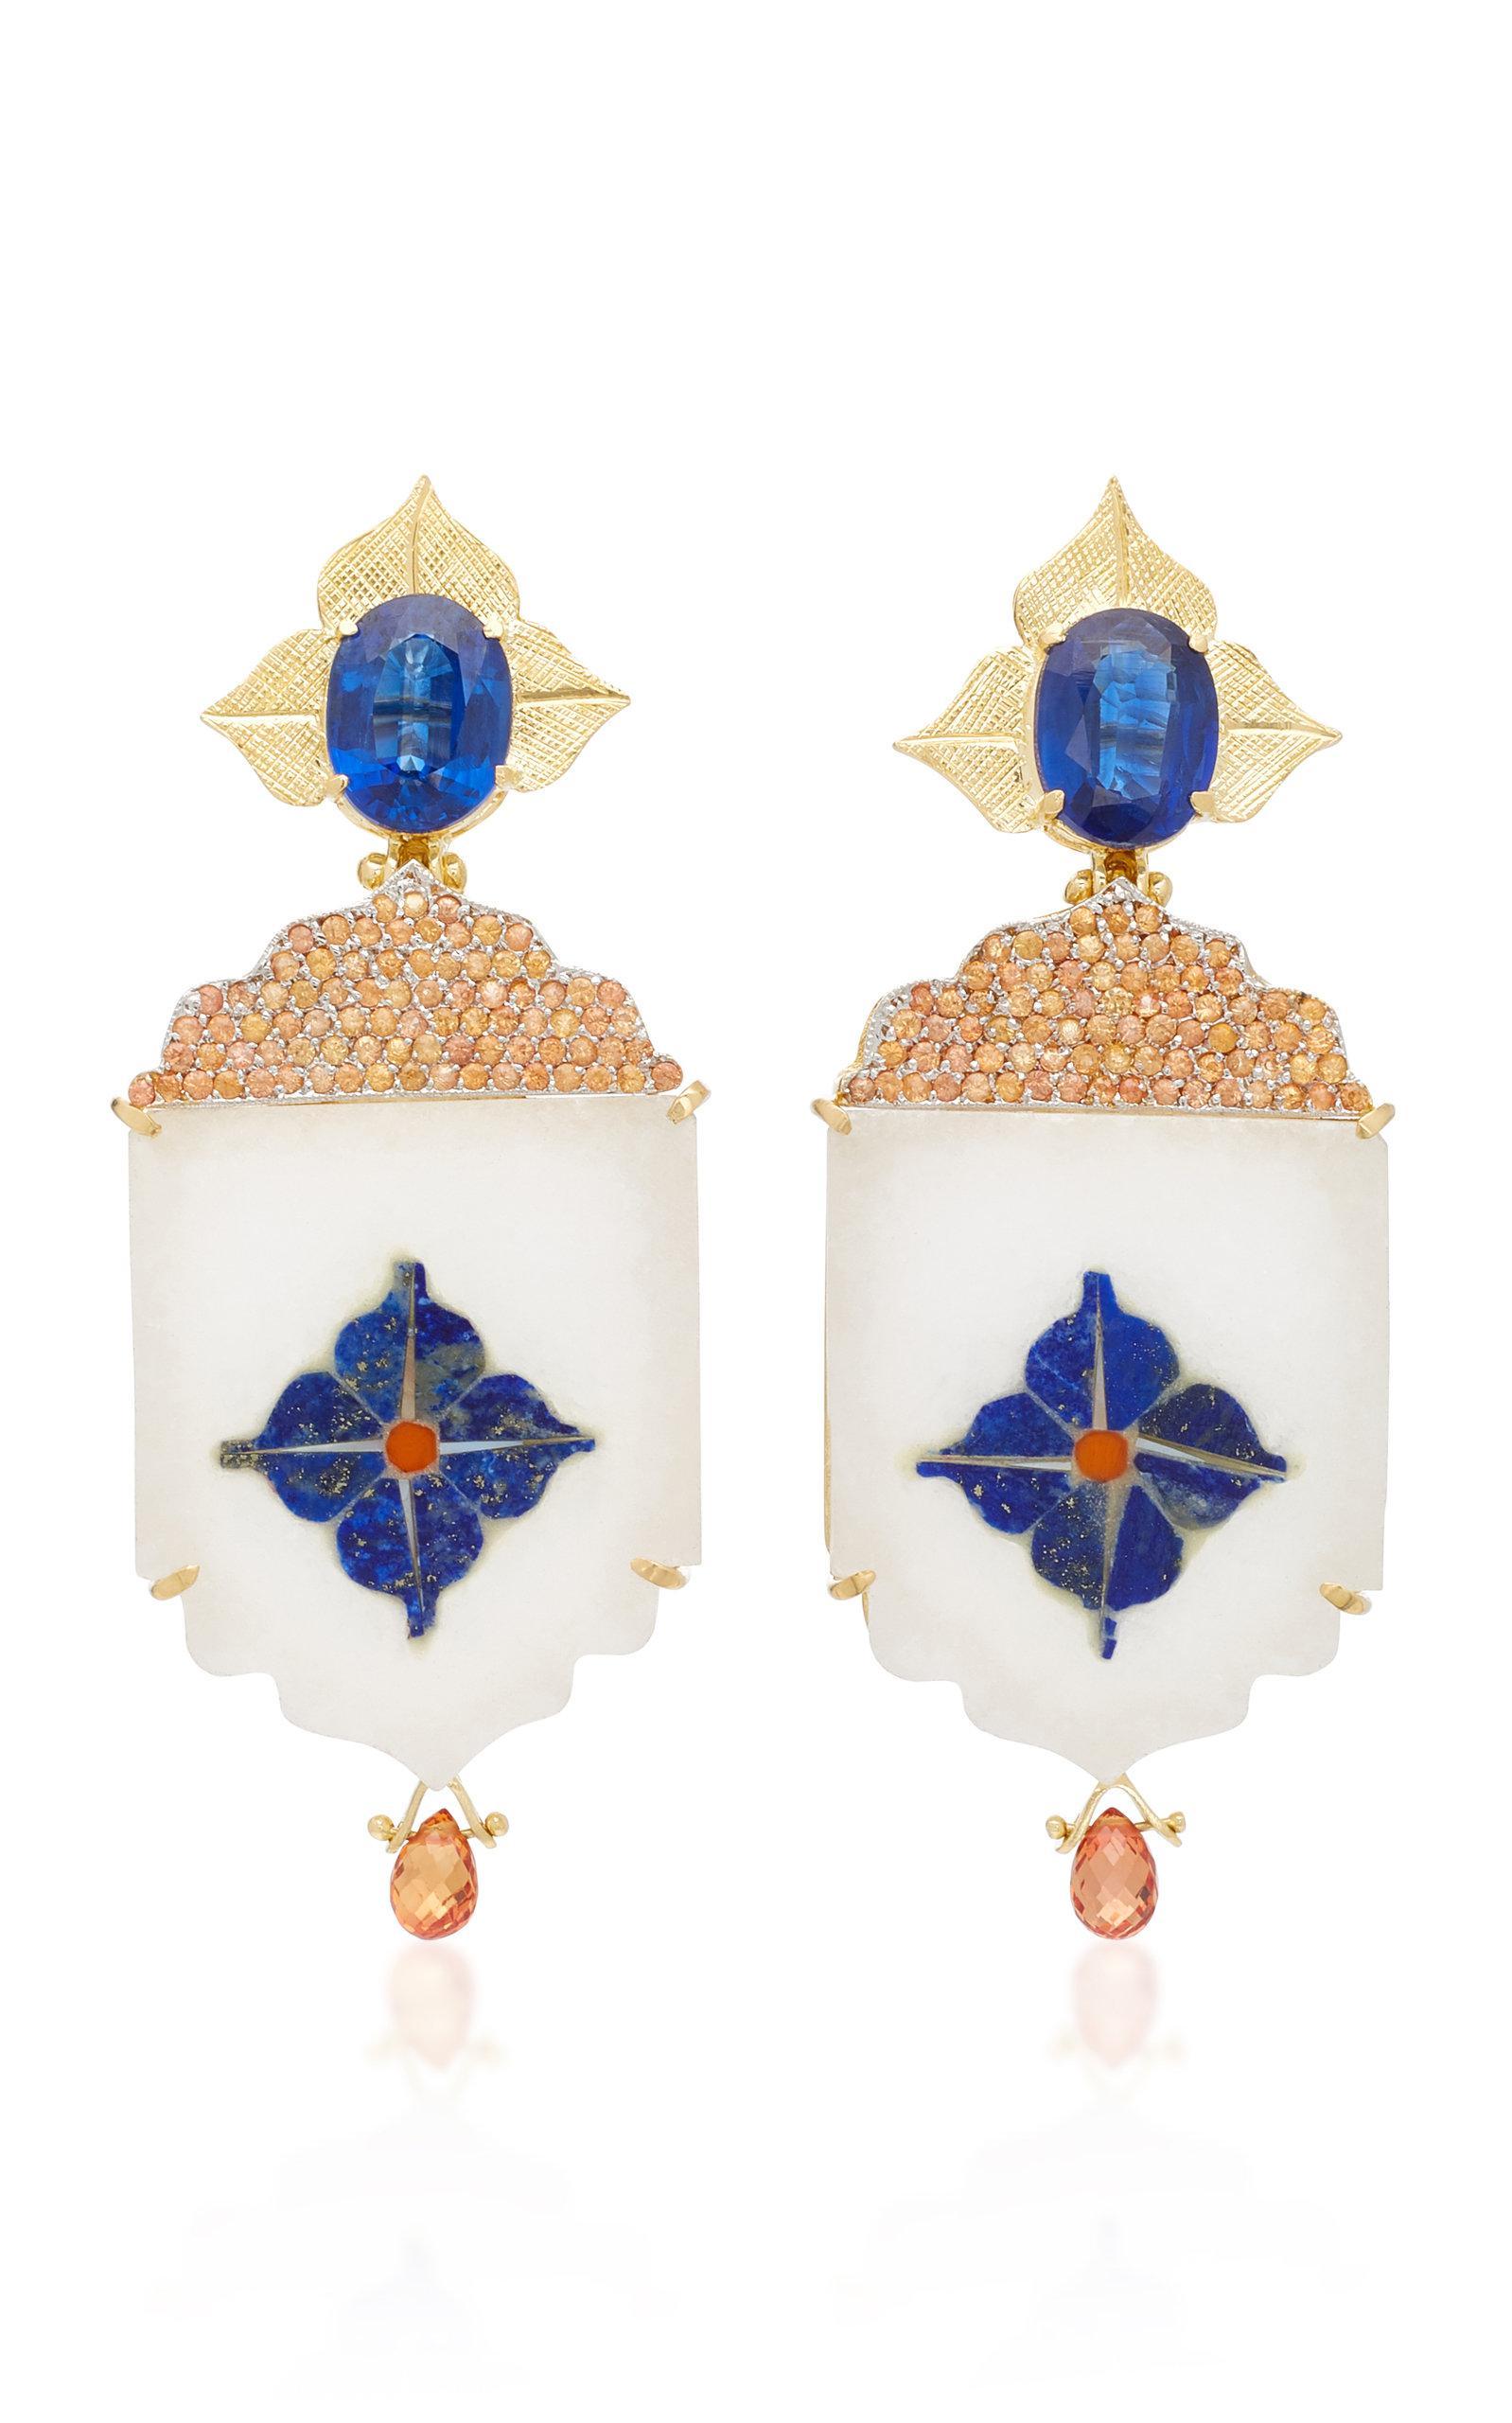 India Marble Mosaic Green Tourmaline Earrings Silvia Furmanovich fIoc0iP